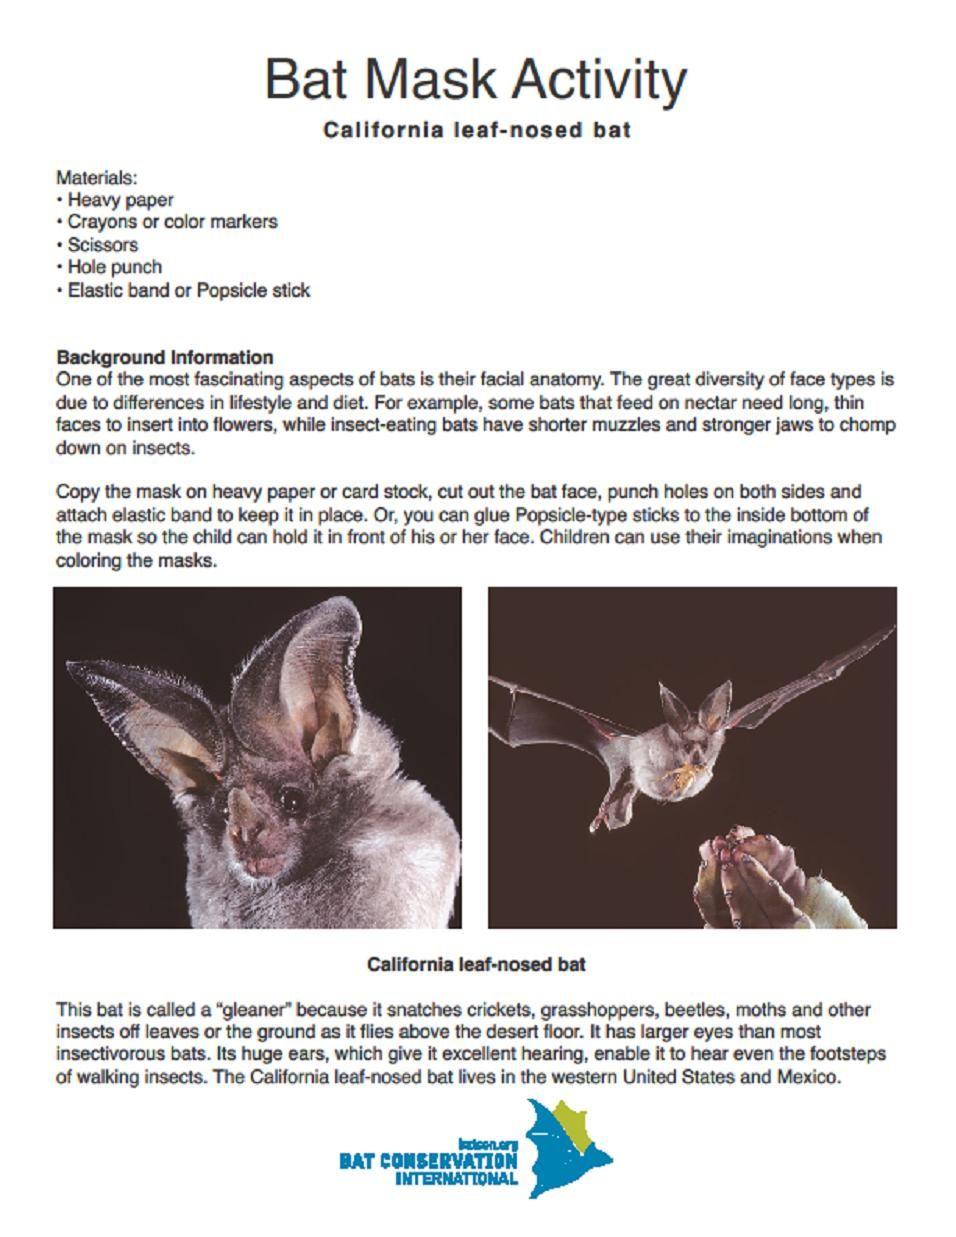 Bat Mask Activity Bat Conservation International